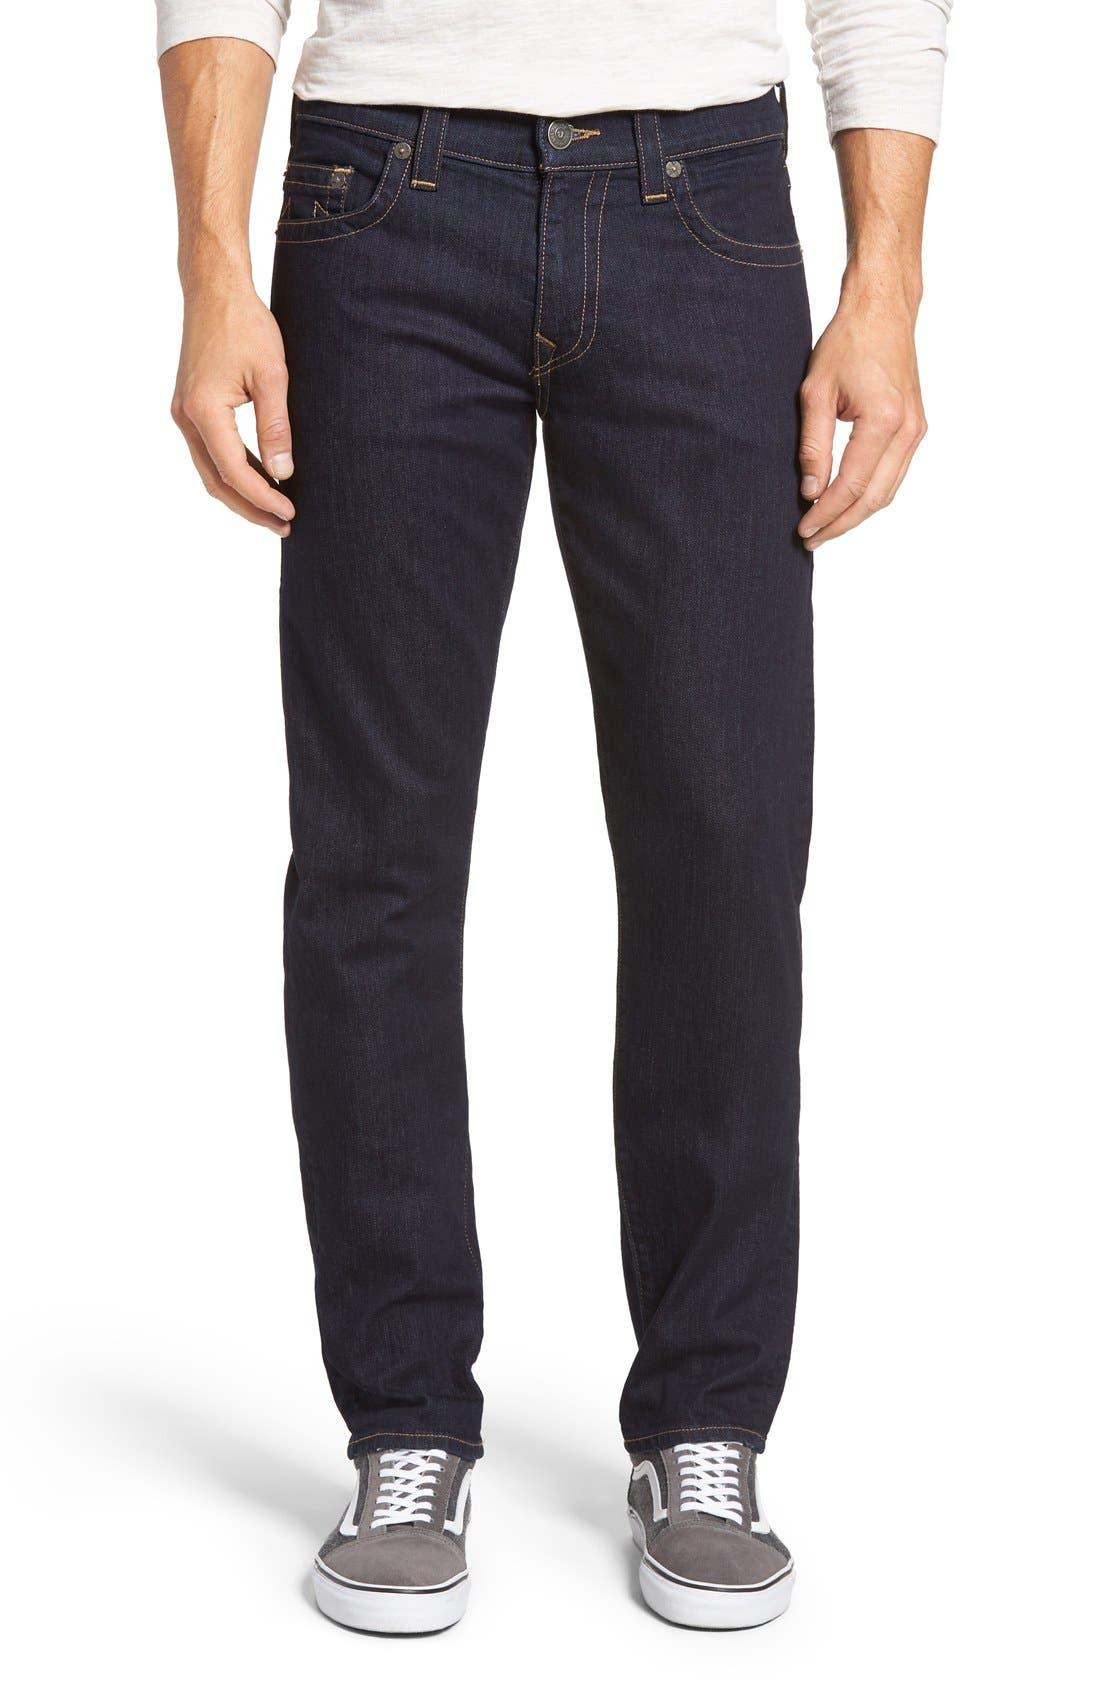 Geno Straight Leg Jeans,                             Main thumbnail 1, color,                             2S Body Rinse